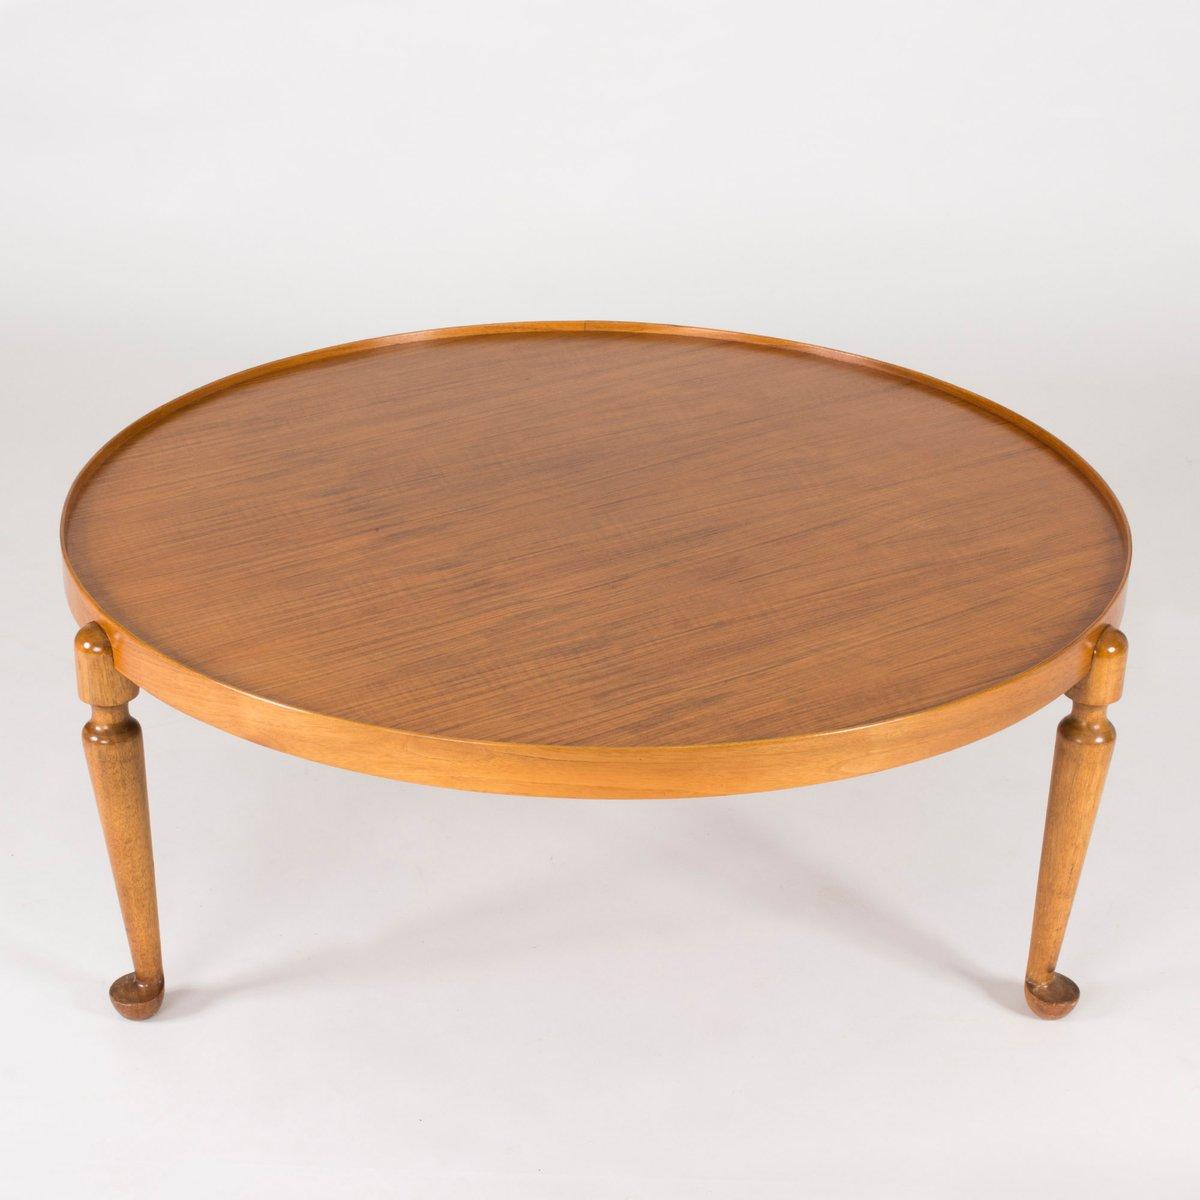 midcentury swedish round walnut coffee table by josef frank for  - price per piece